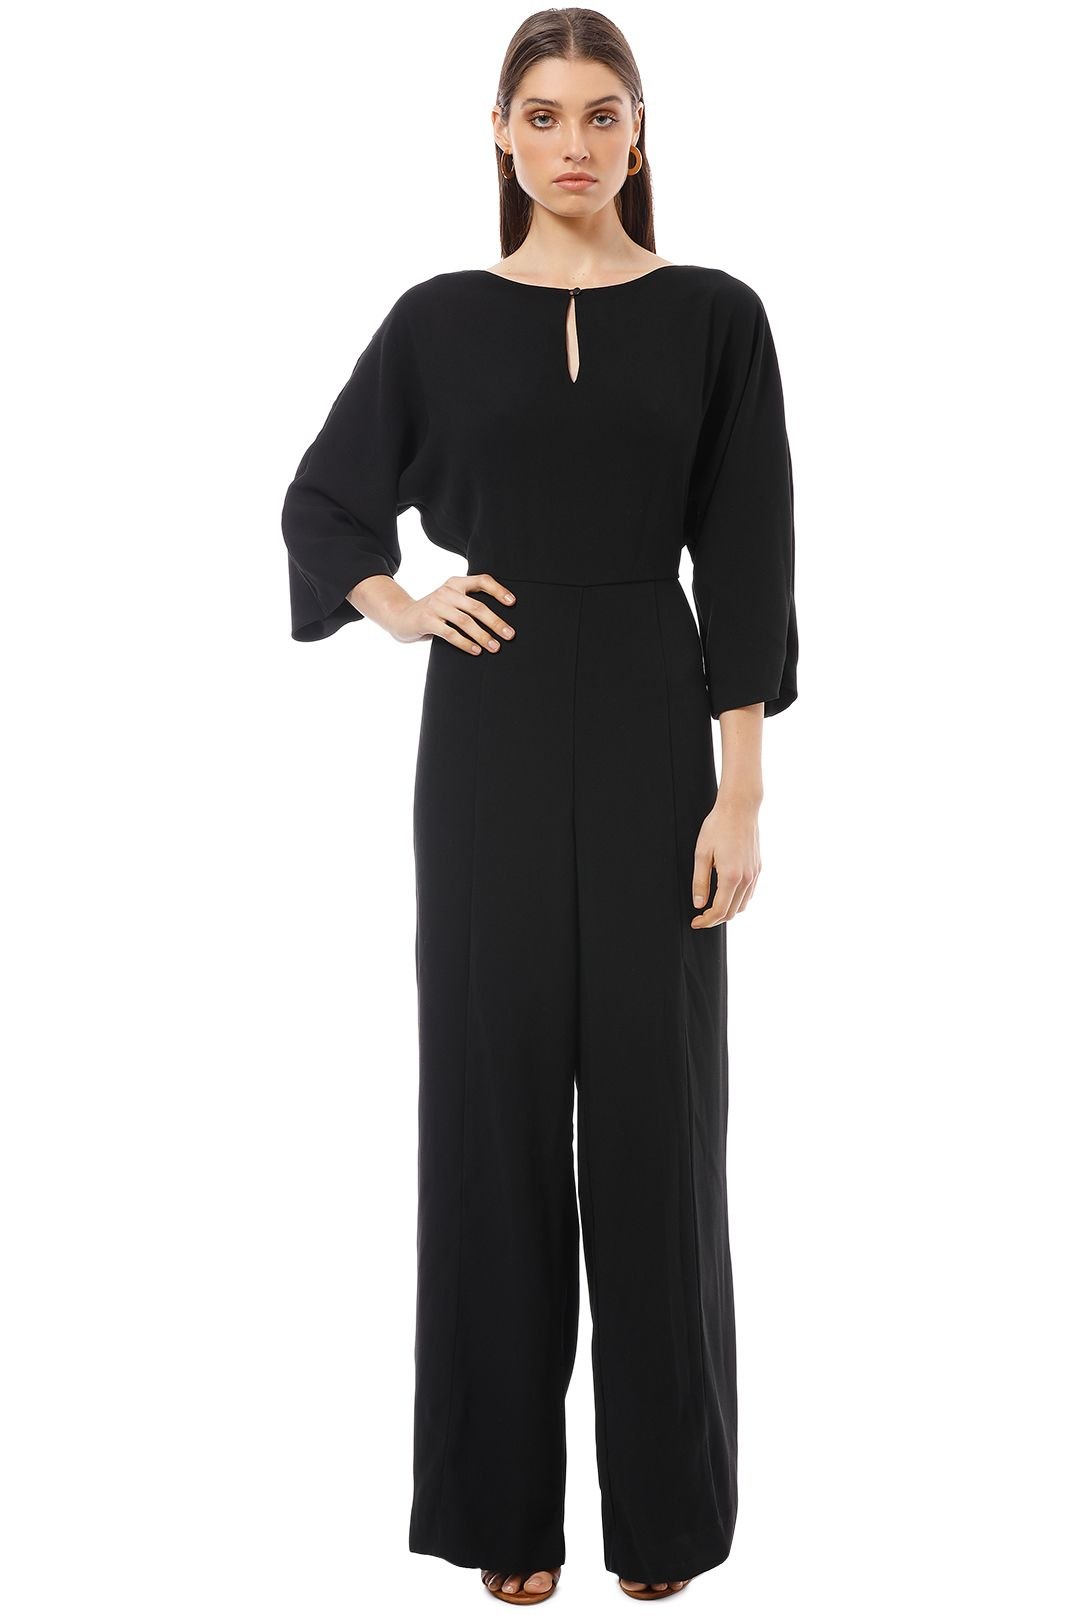 Cue - Crepe Magyar Sleeve Jumpsuit - Black - Front